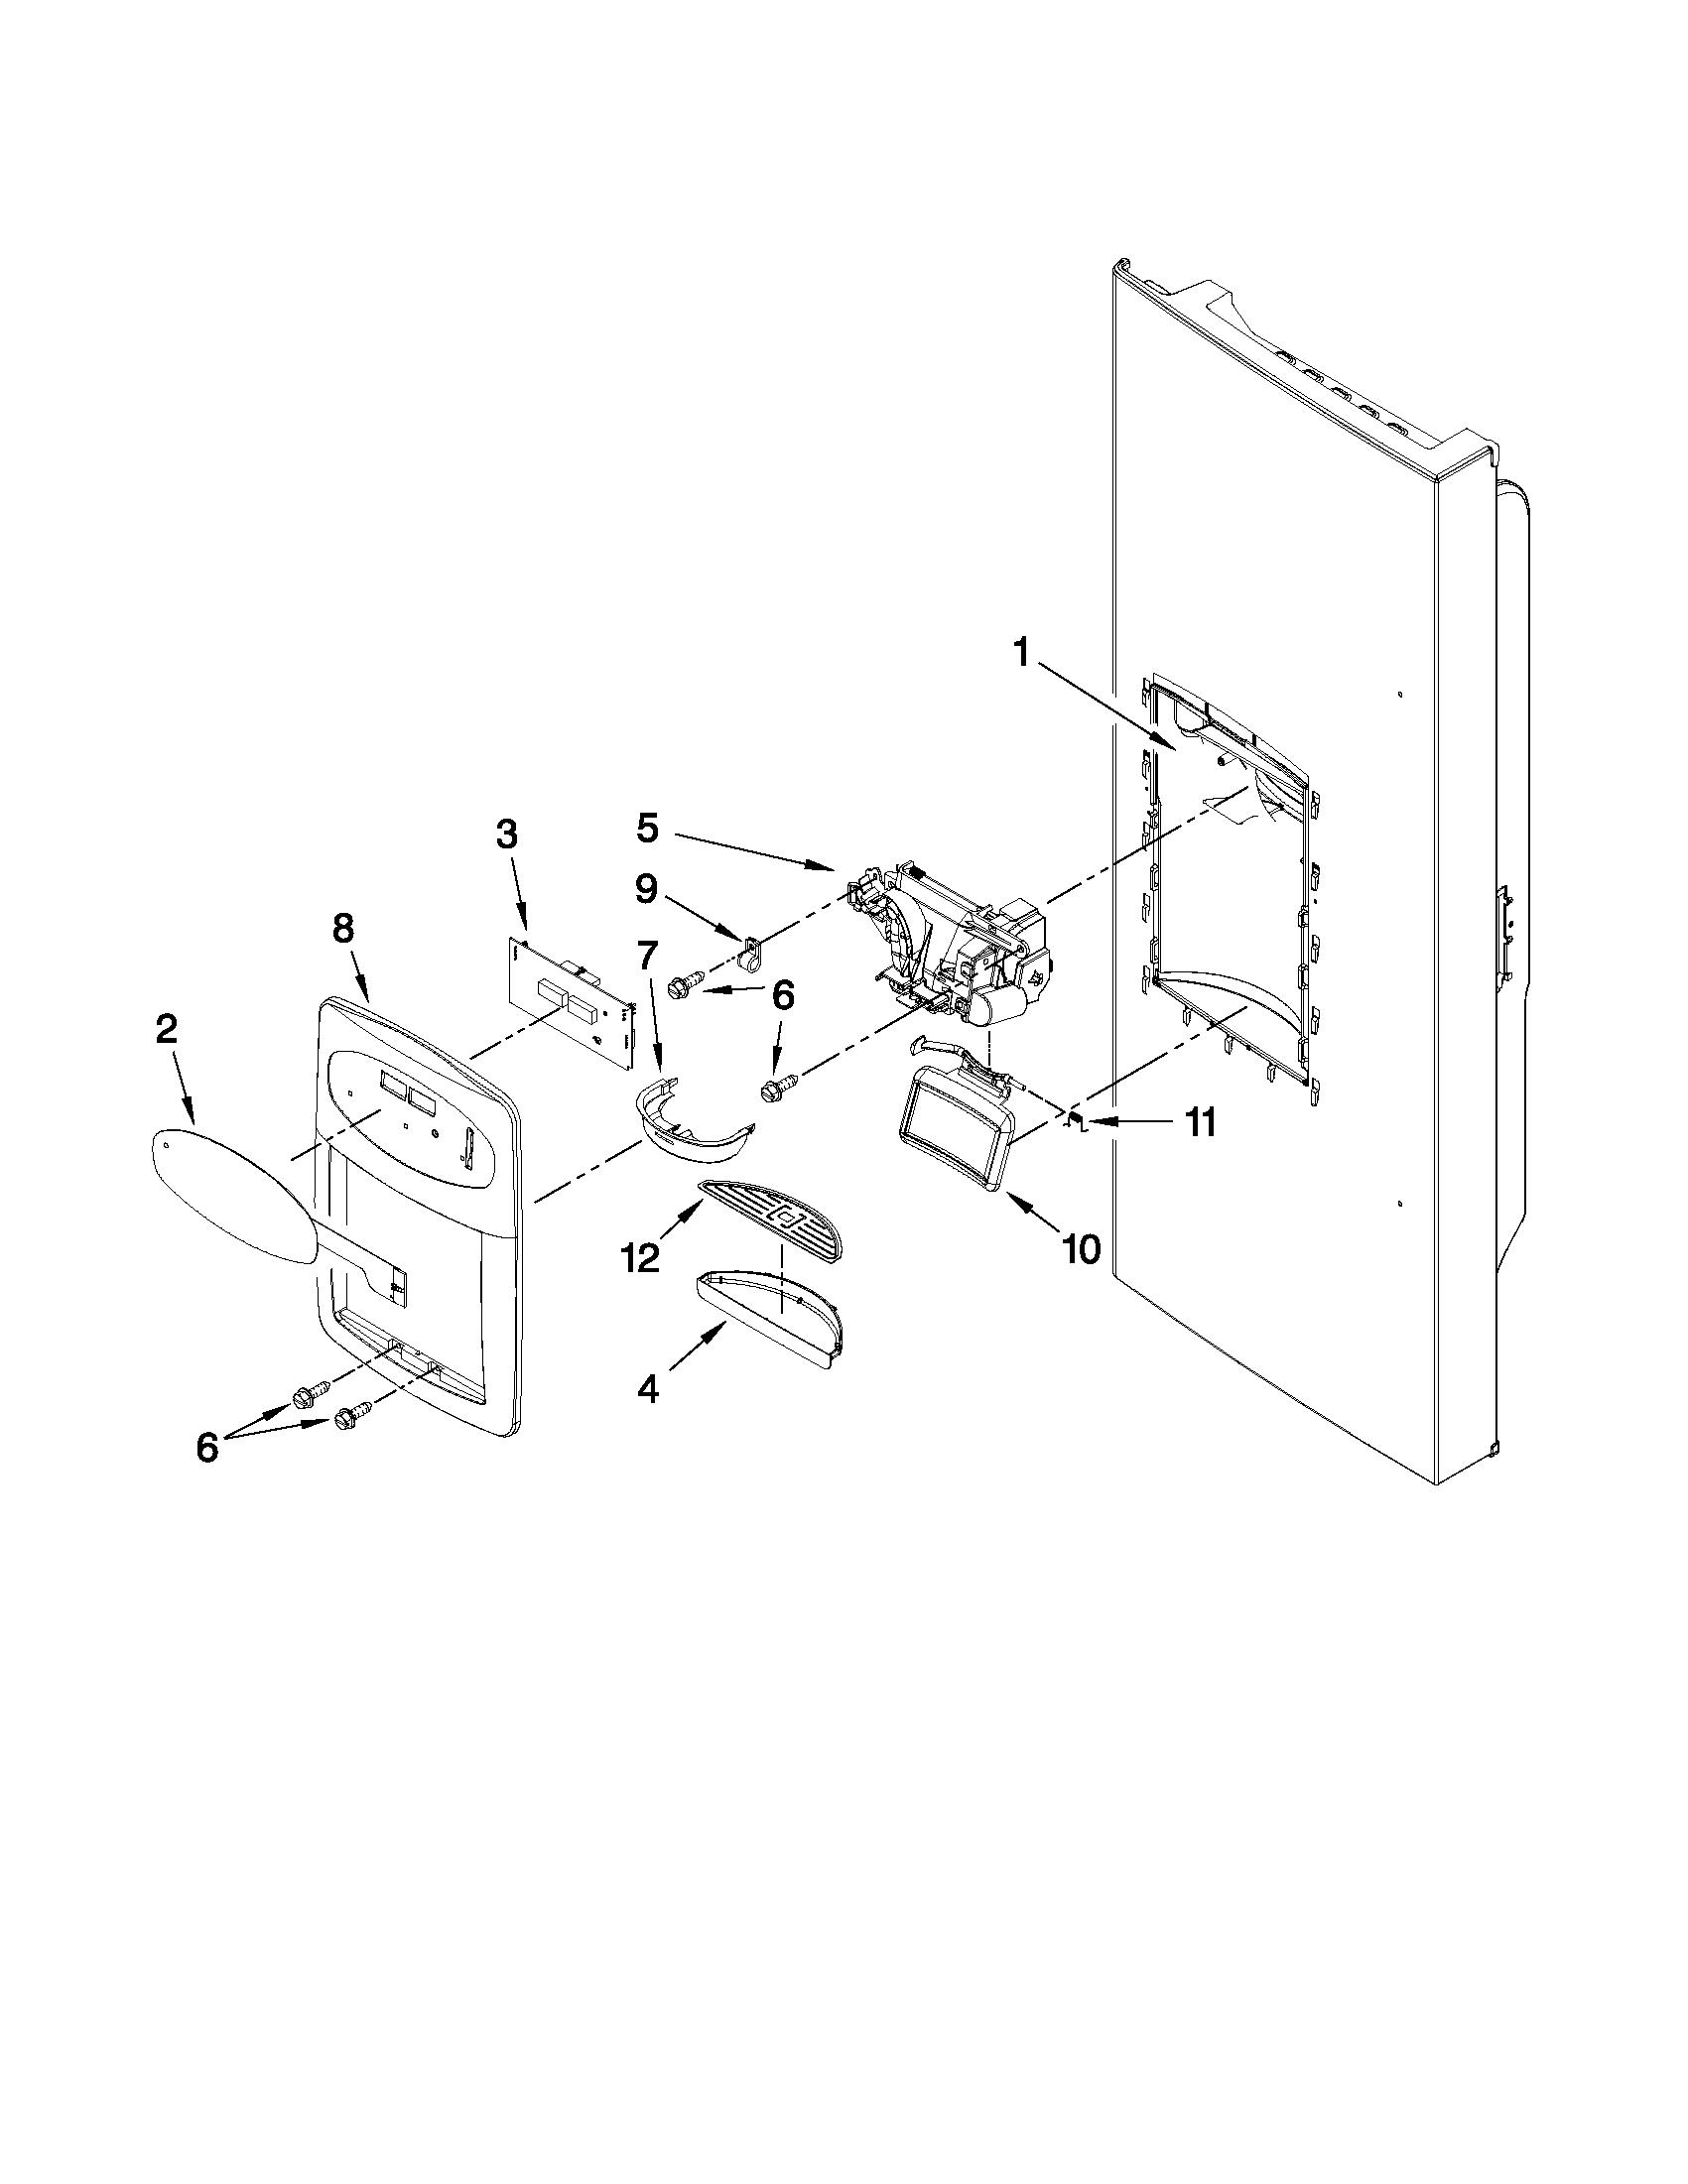 Simple Horn Wiring Diagrams Install 12 Volt Horn Diagram